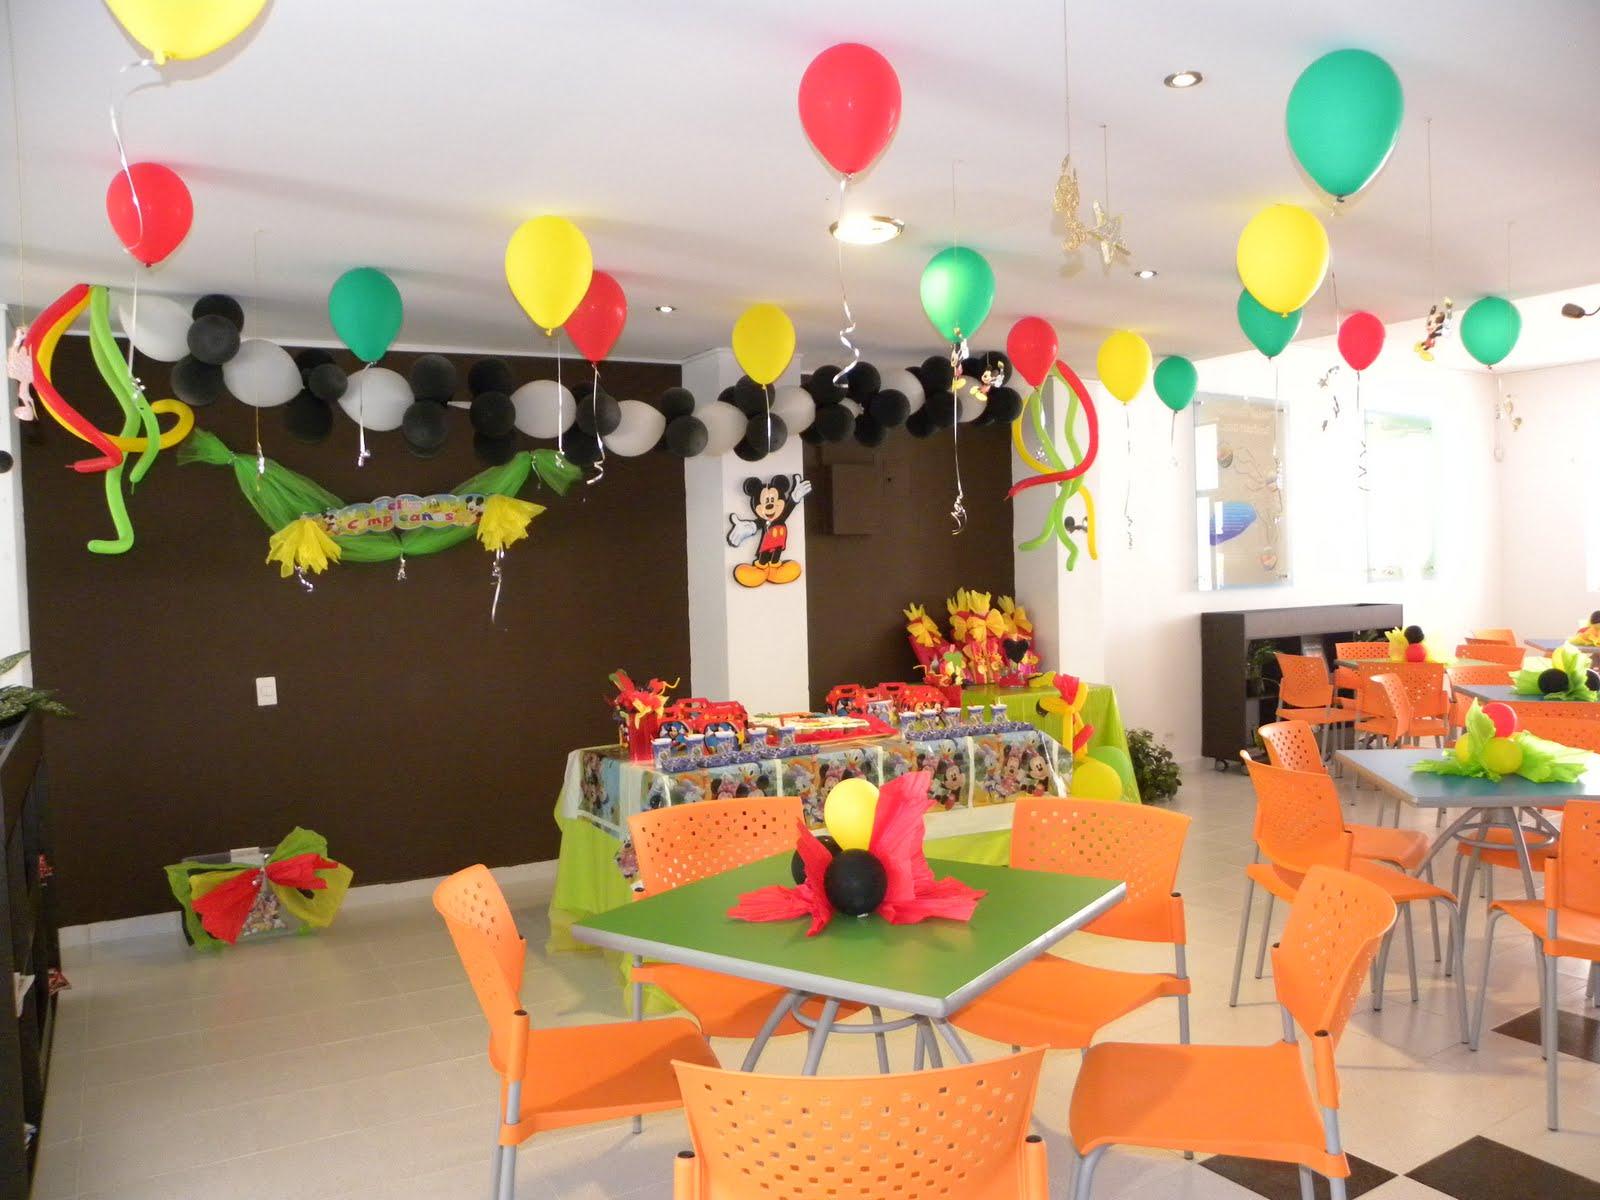 Ideas Fiesta De Cumpleaos Adultos - Ideas-para-fiestas-adultos